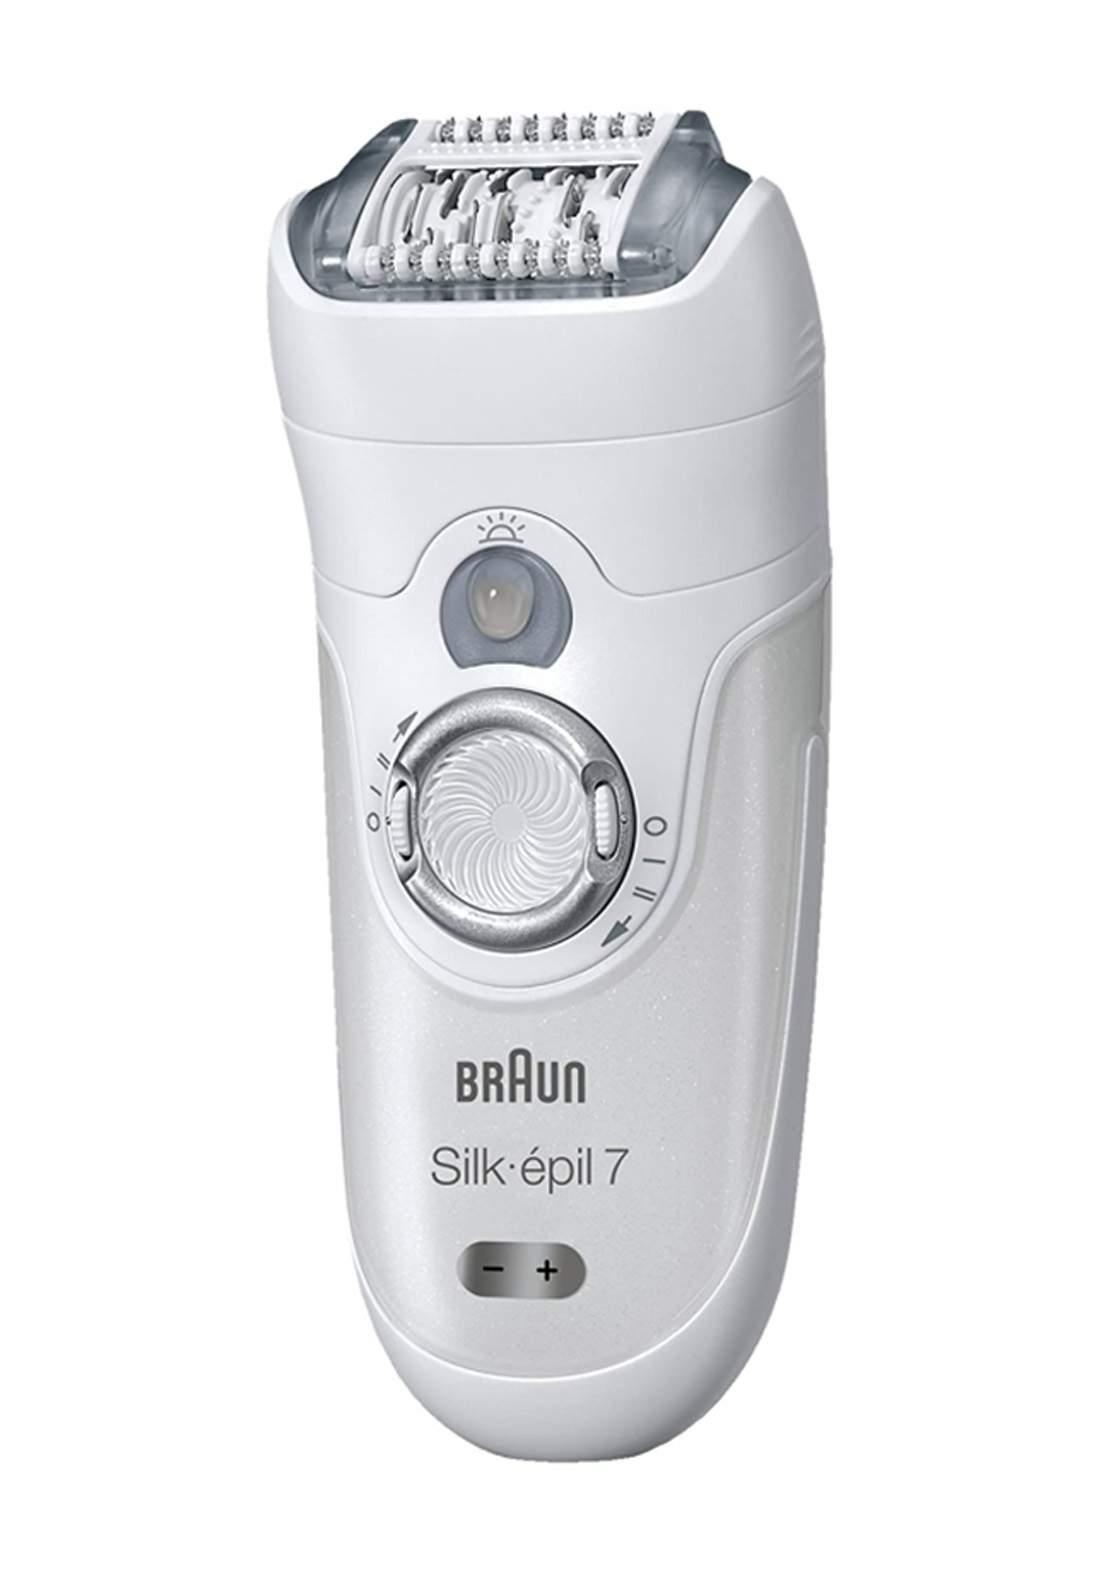 Braun SE7-561 - Epilator - White ماكنة حلاقة نسائية